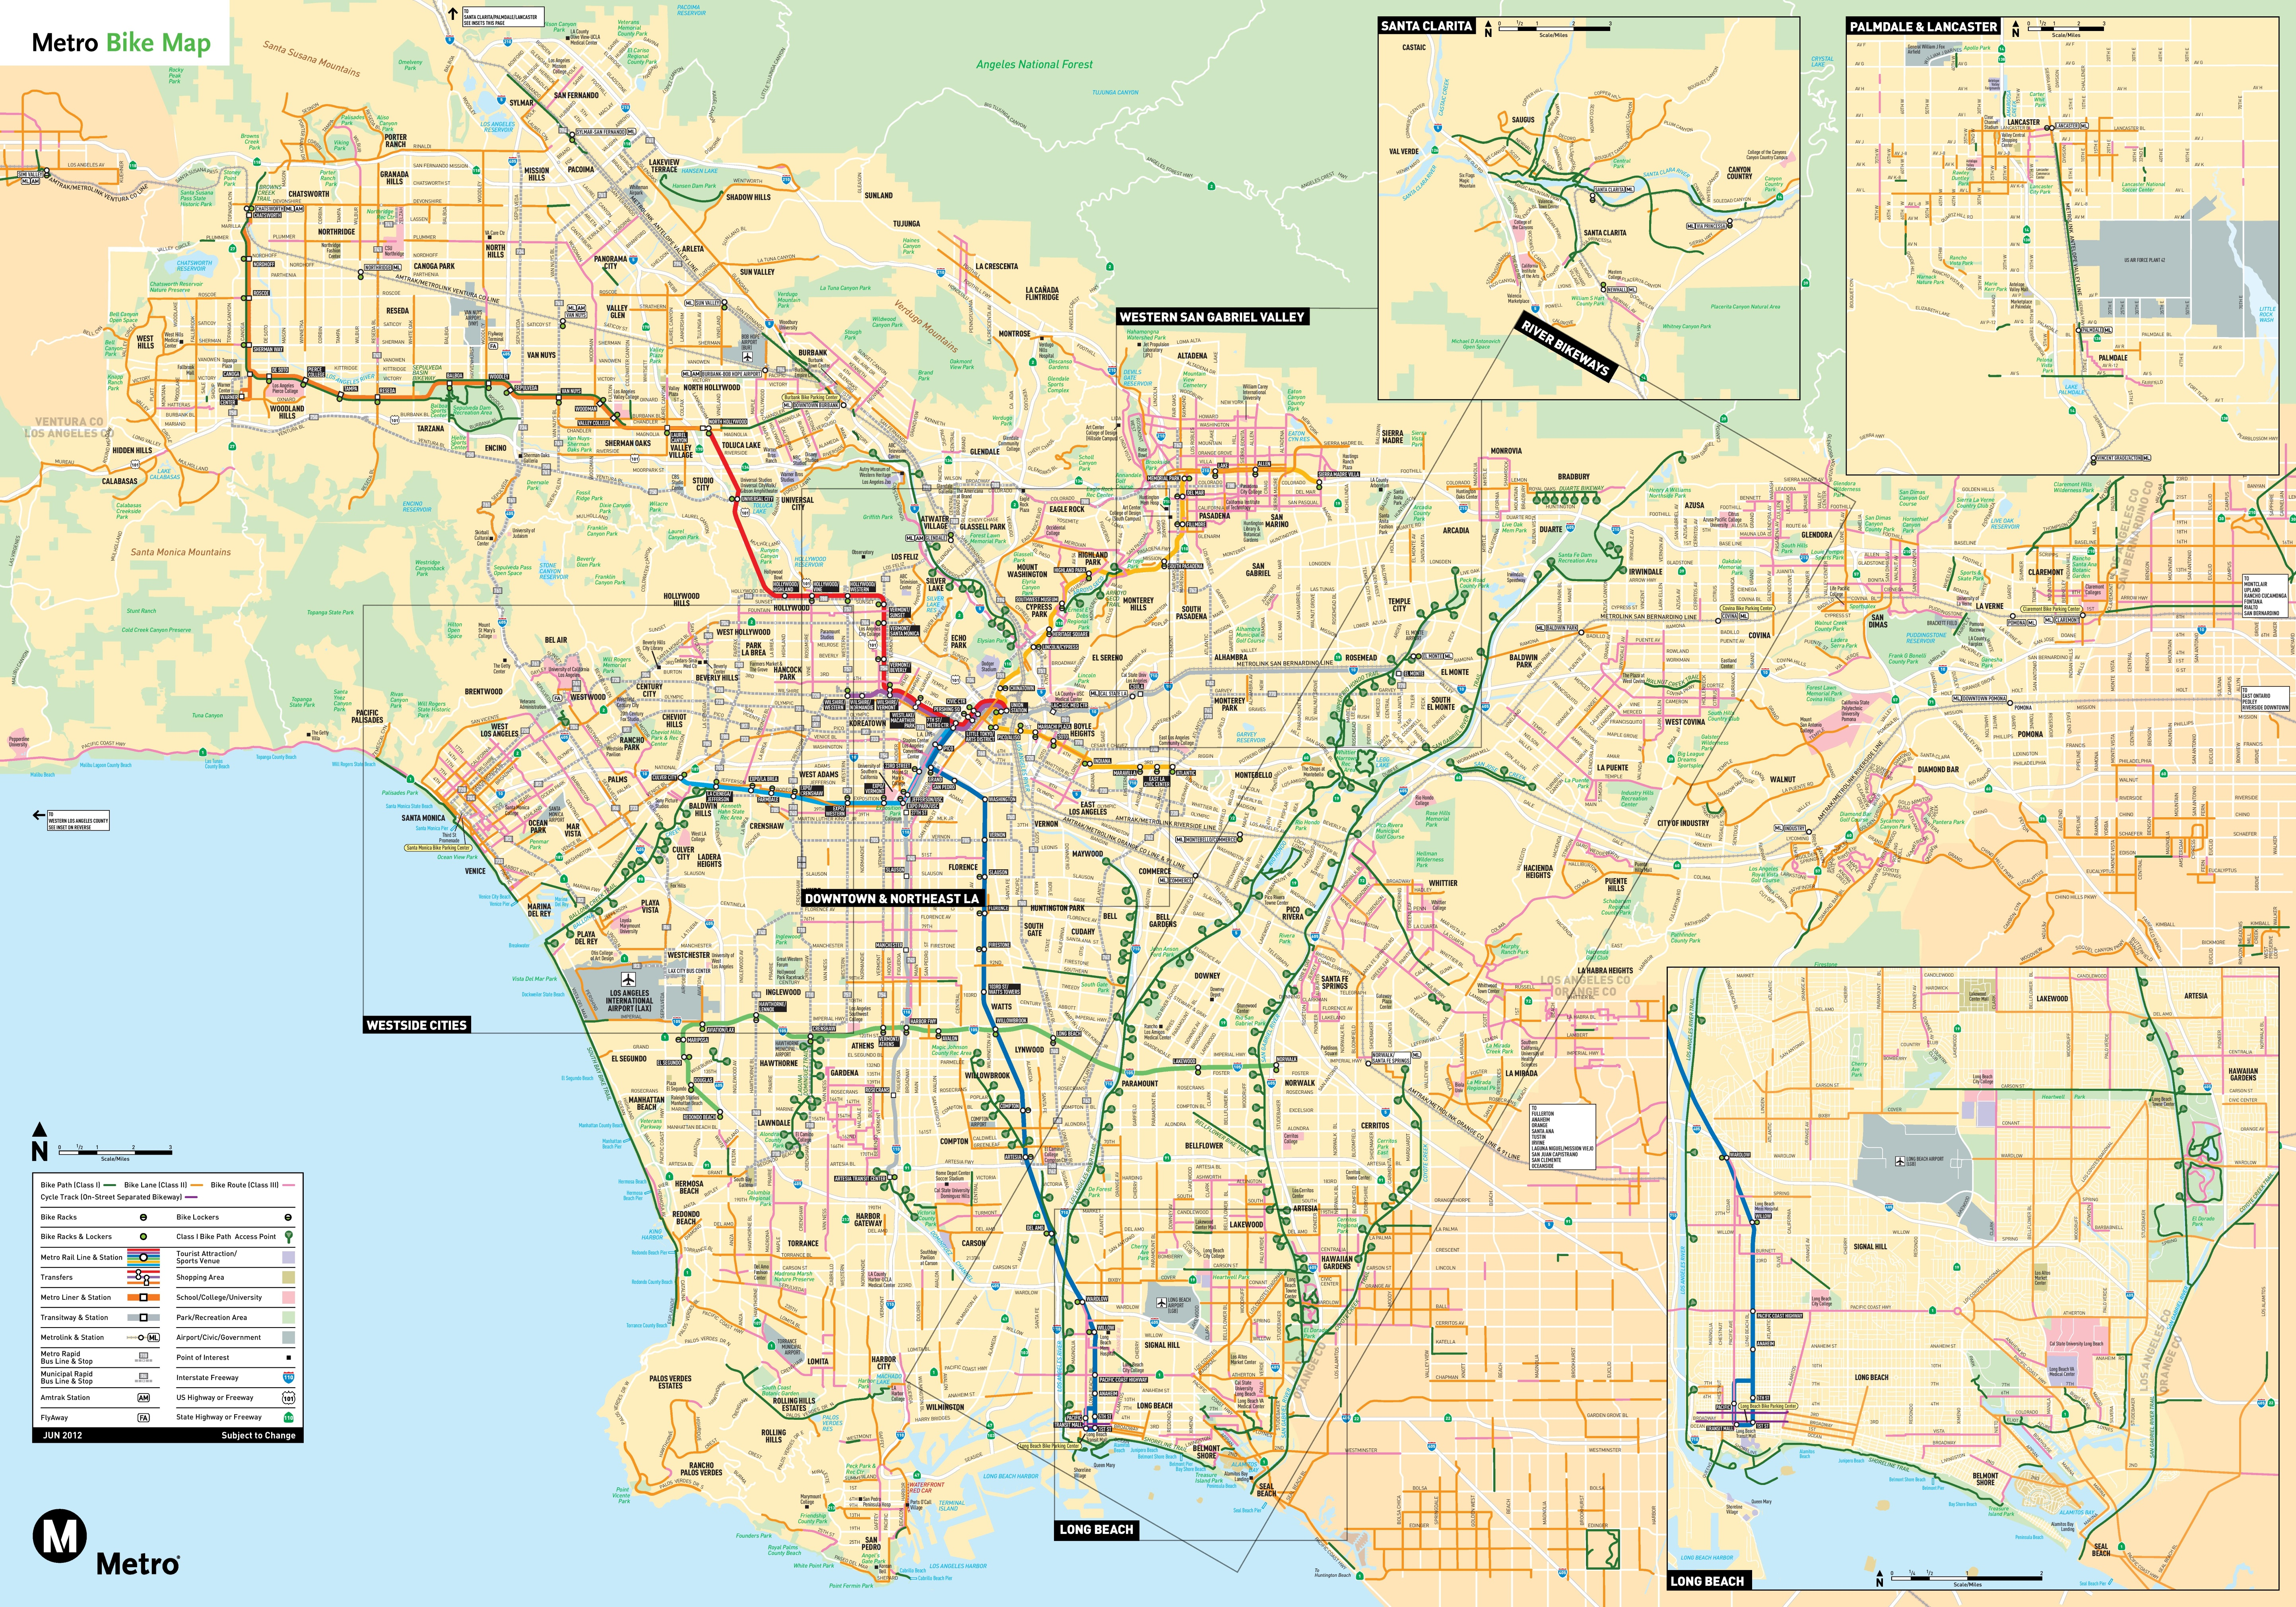 Los Angeles Bike Map - Los angeles in world map